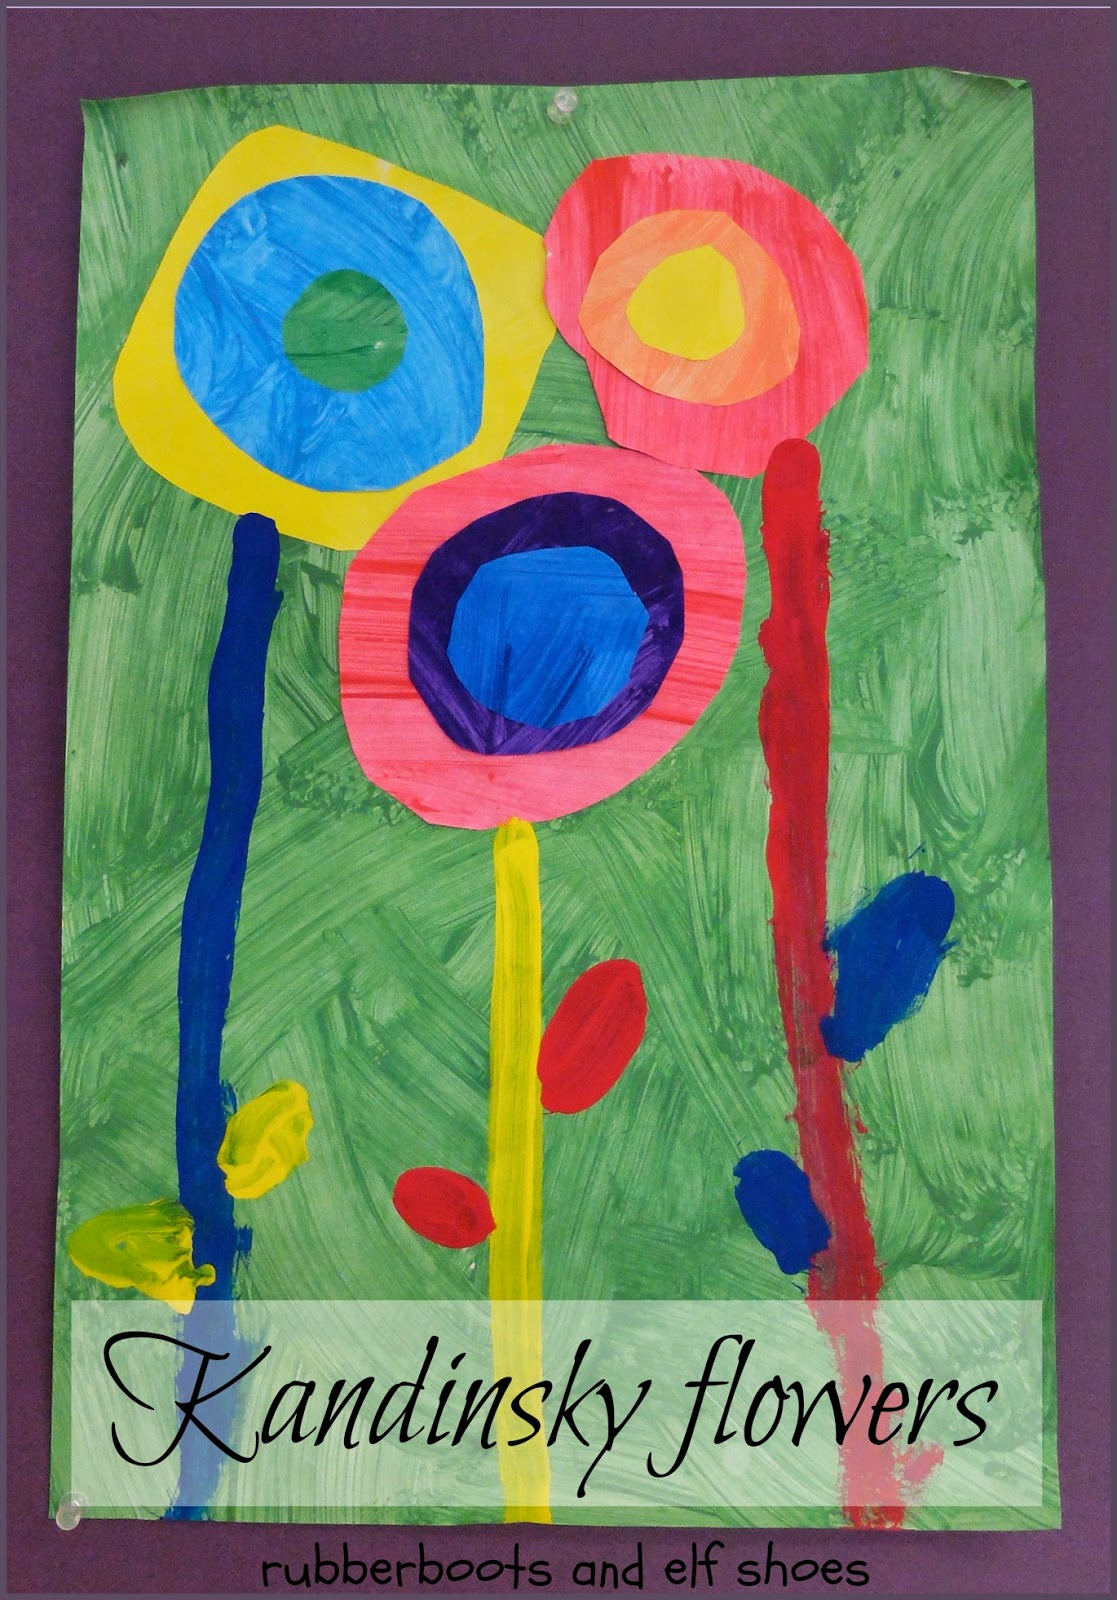 Kandinsky circles - spring style